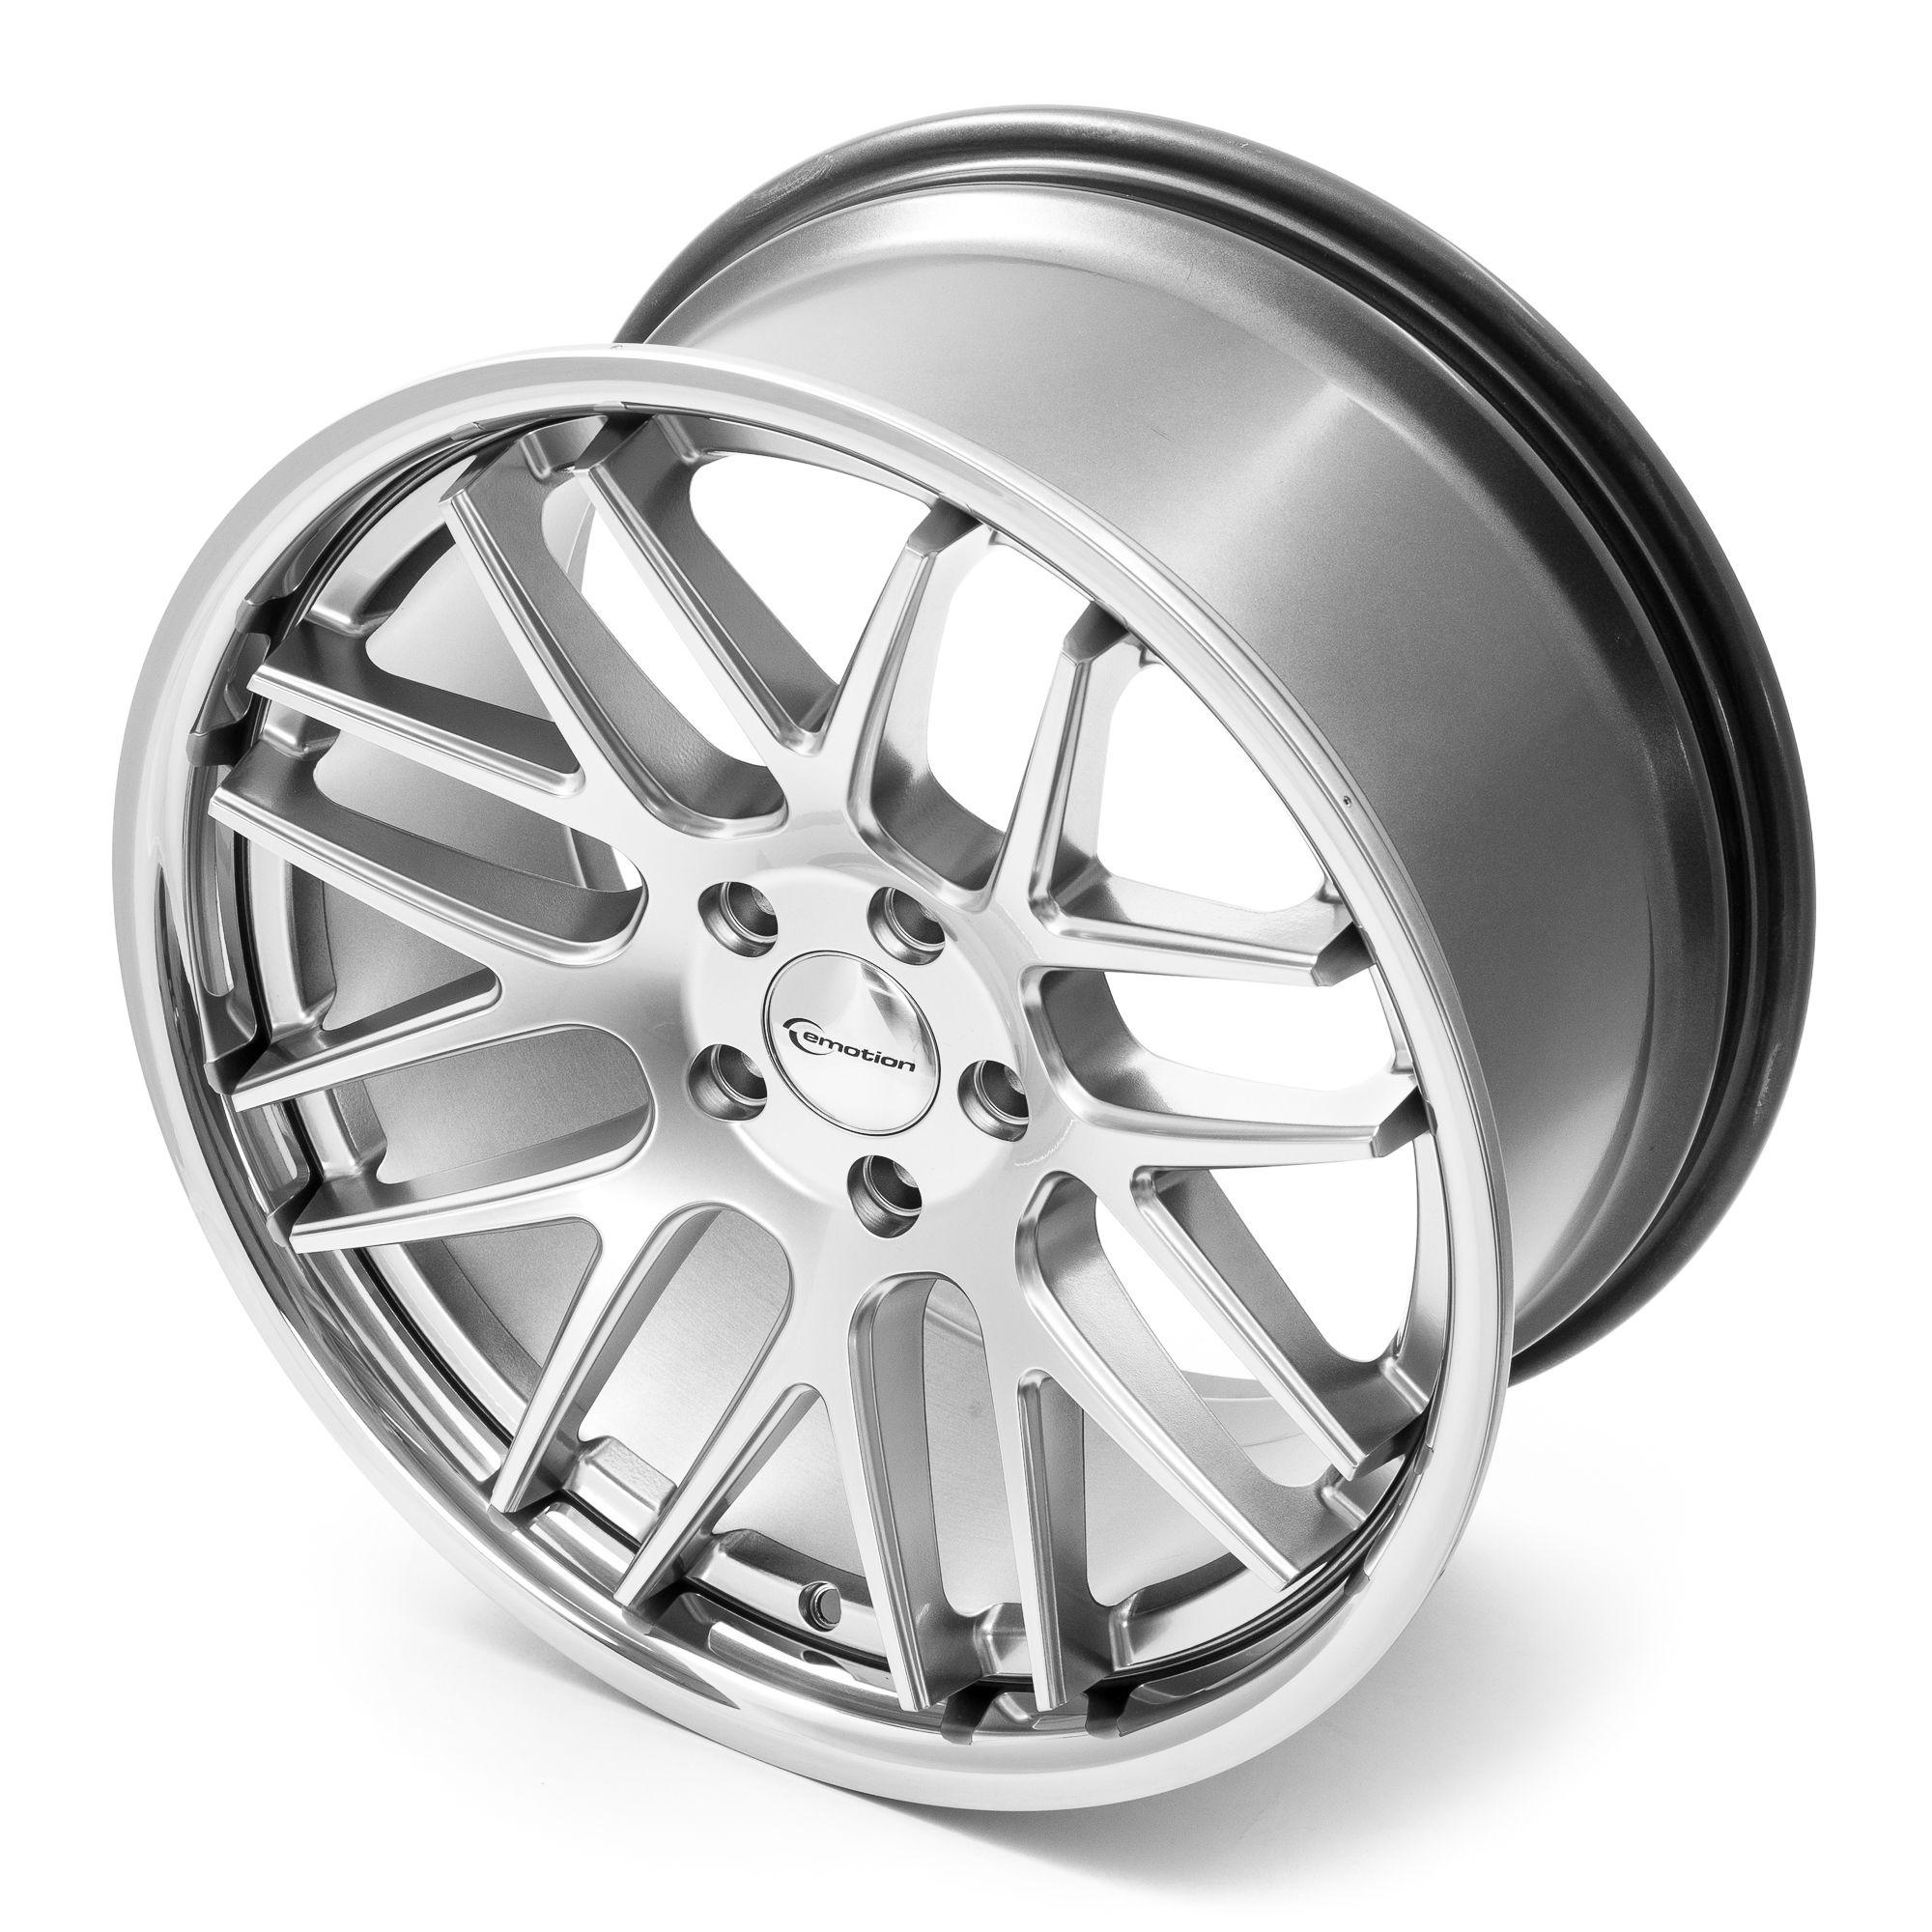 emotion wheels concave felgen hyper silver inox silber. Black Bedroom Furniture Sets. Home Design Ideas